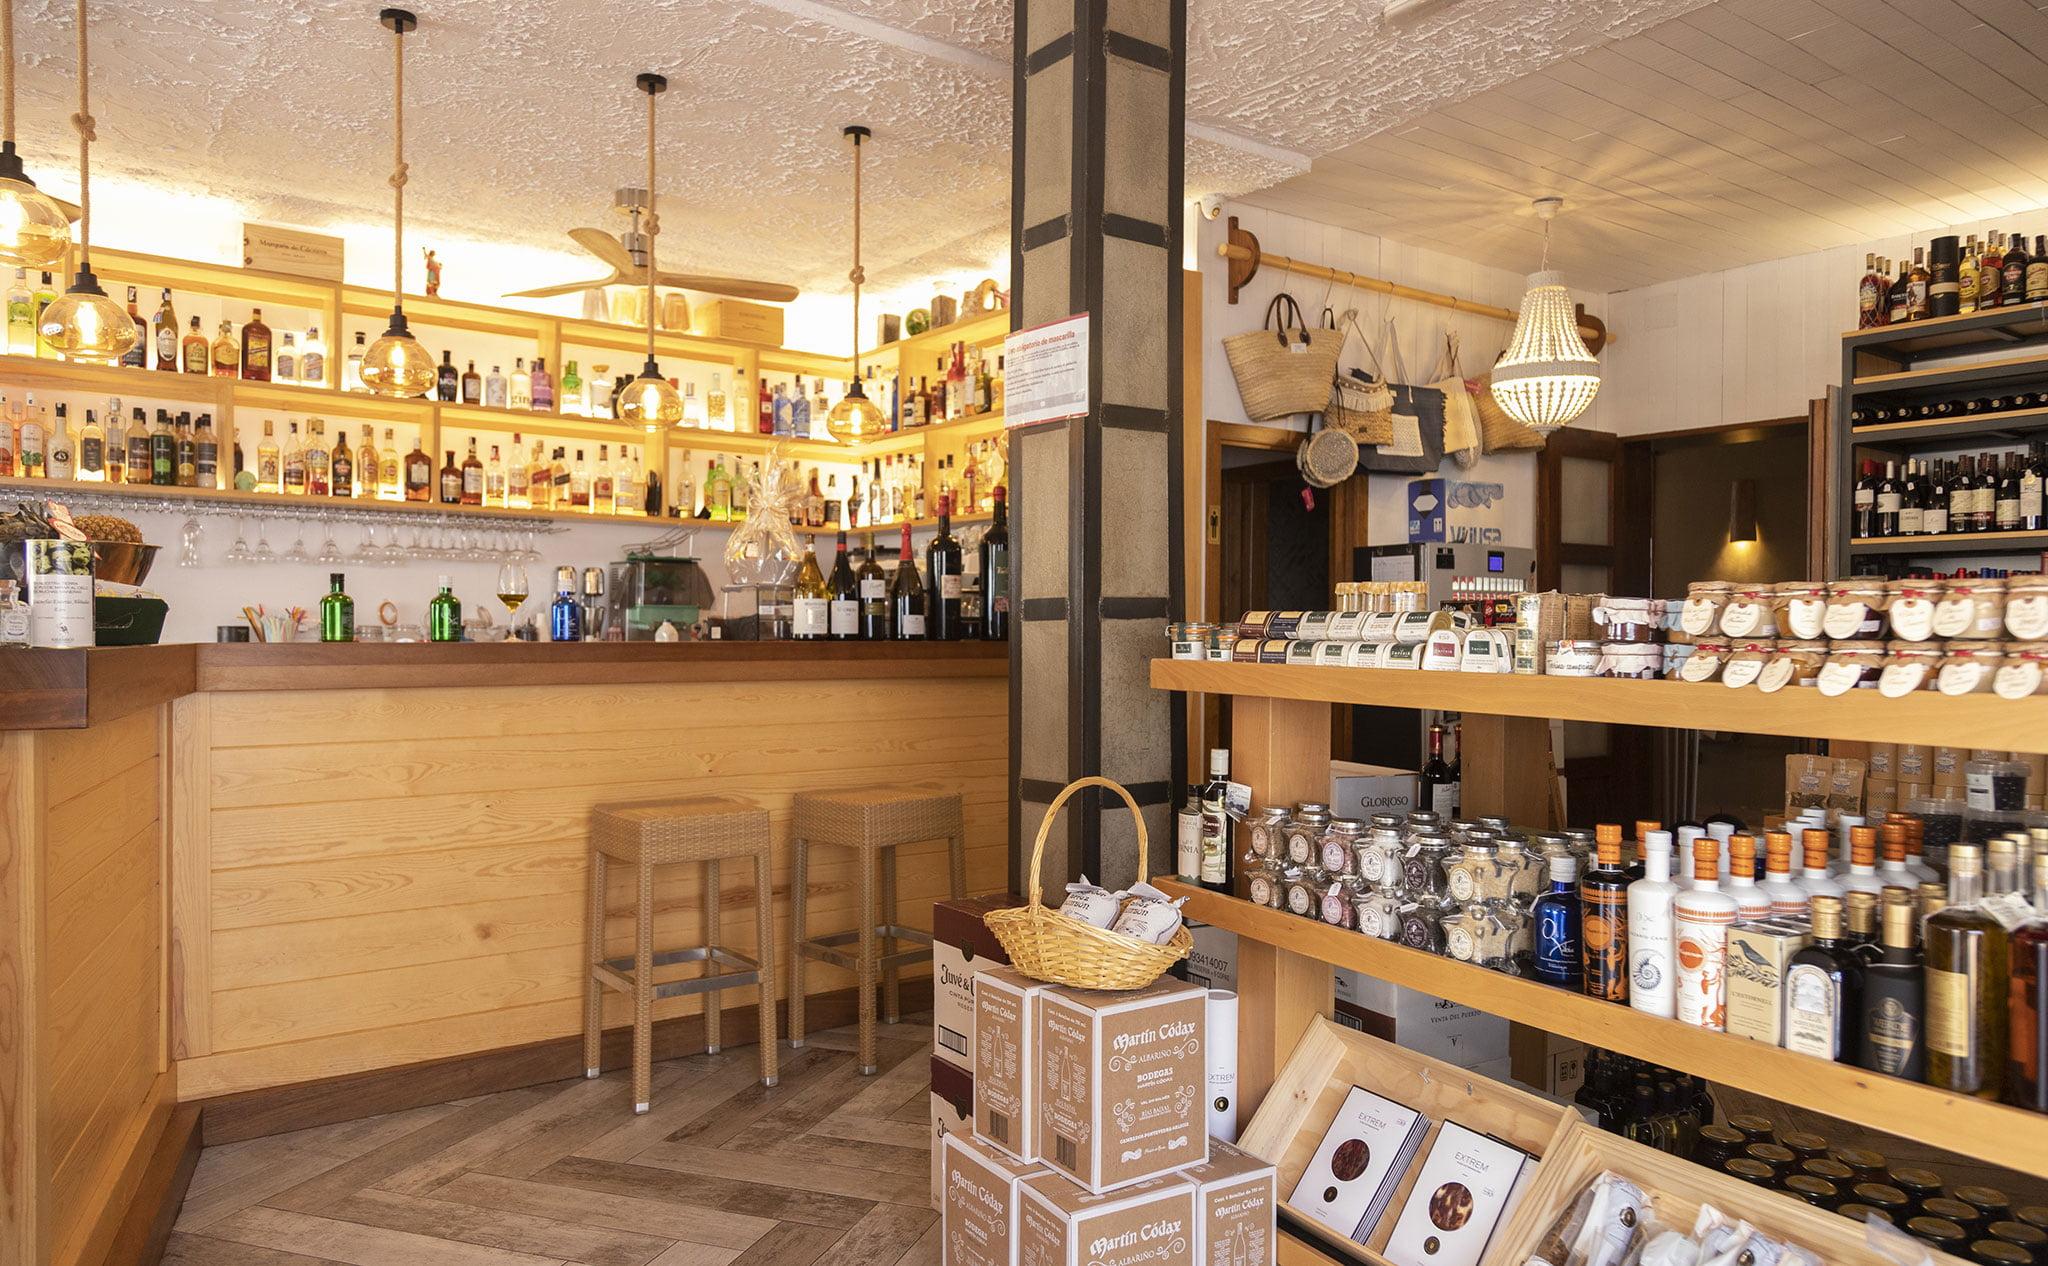 Interior de El Celler de La Fontana – Restaurante La Fontana